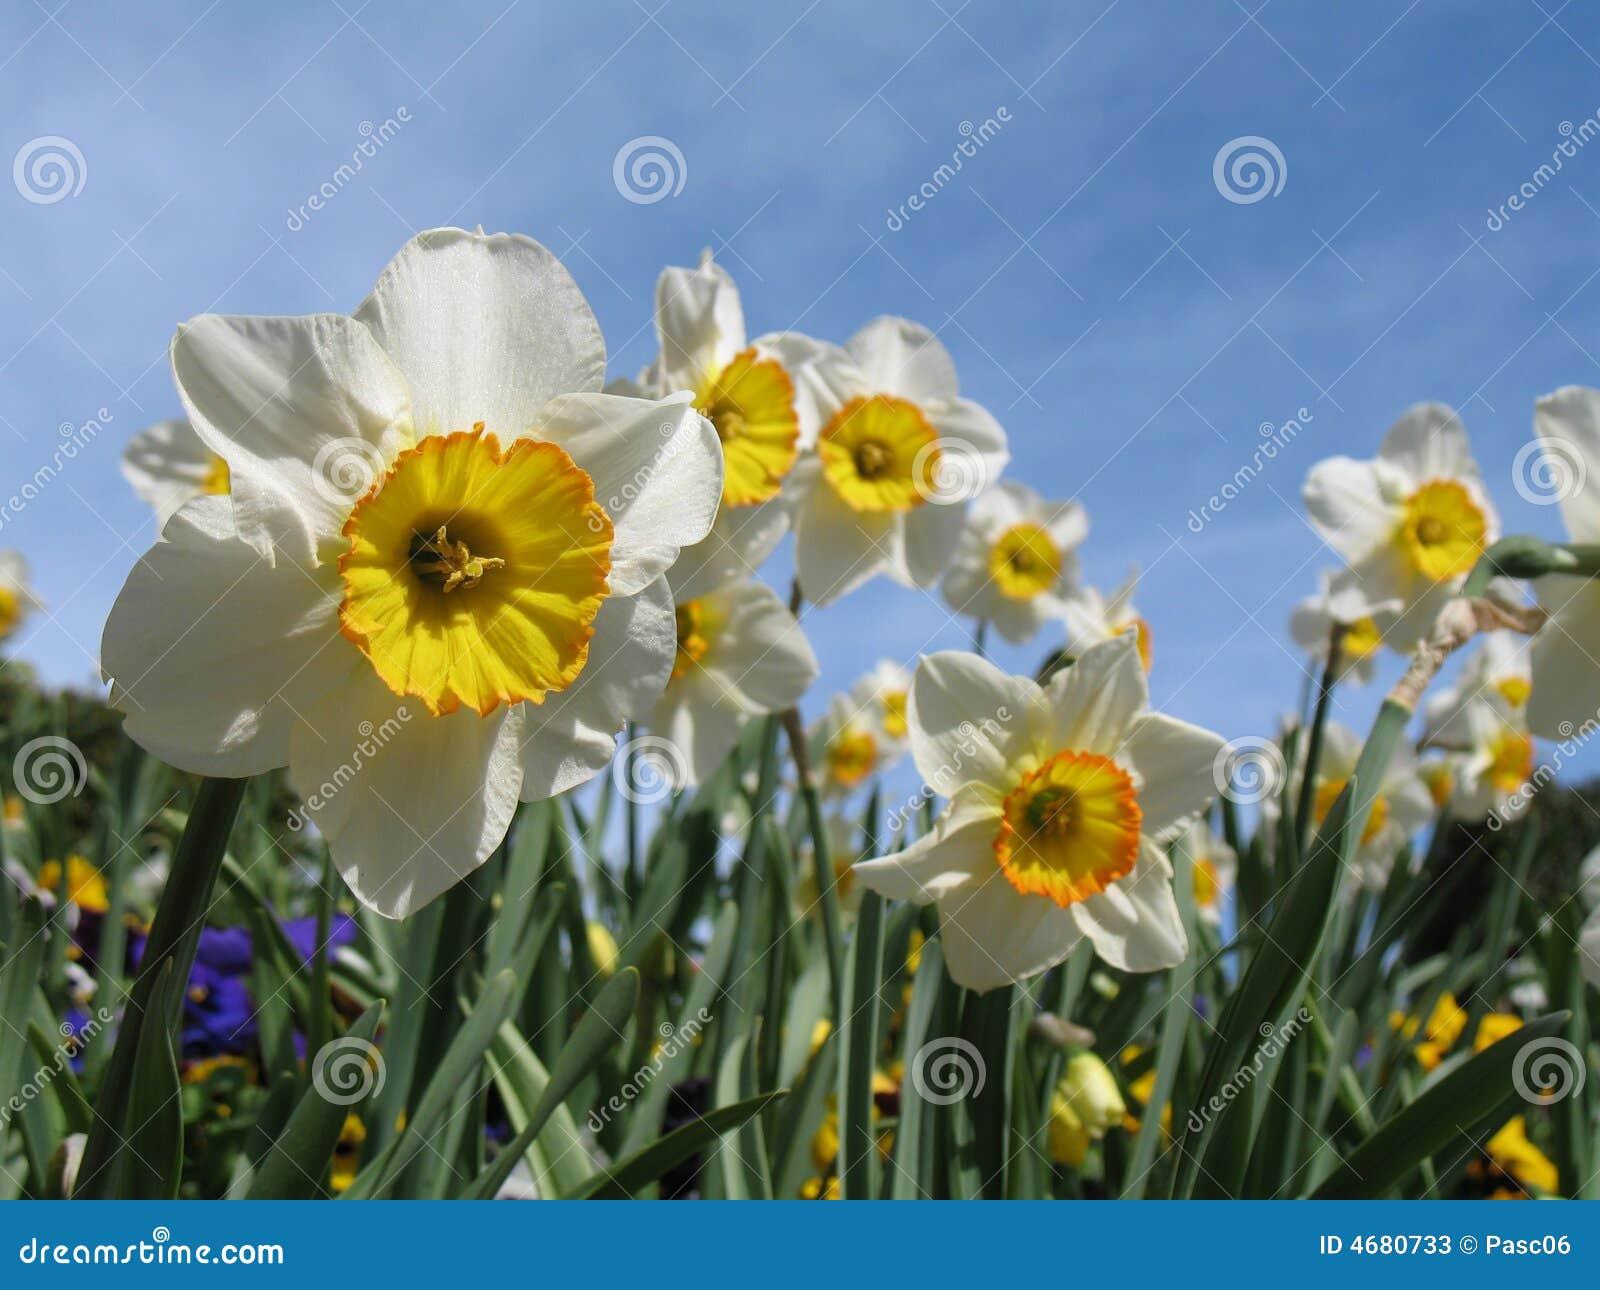 Fie blanc et jaune de jonquilles